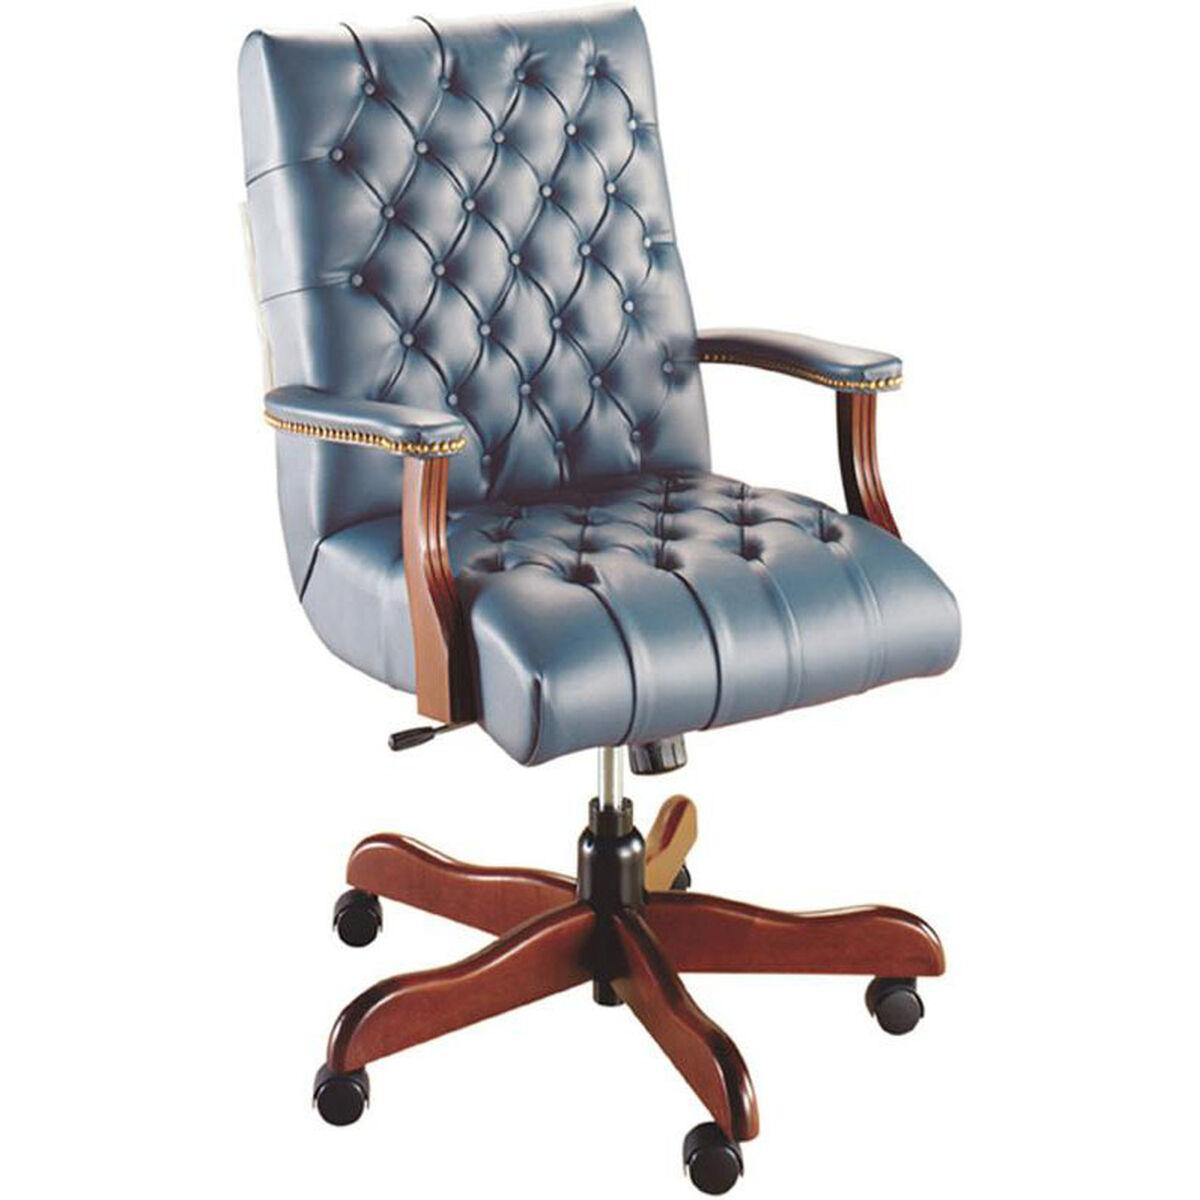 High Point Furniture Industries 4161 Hpf 4161